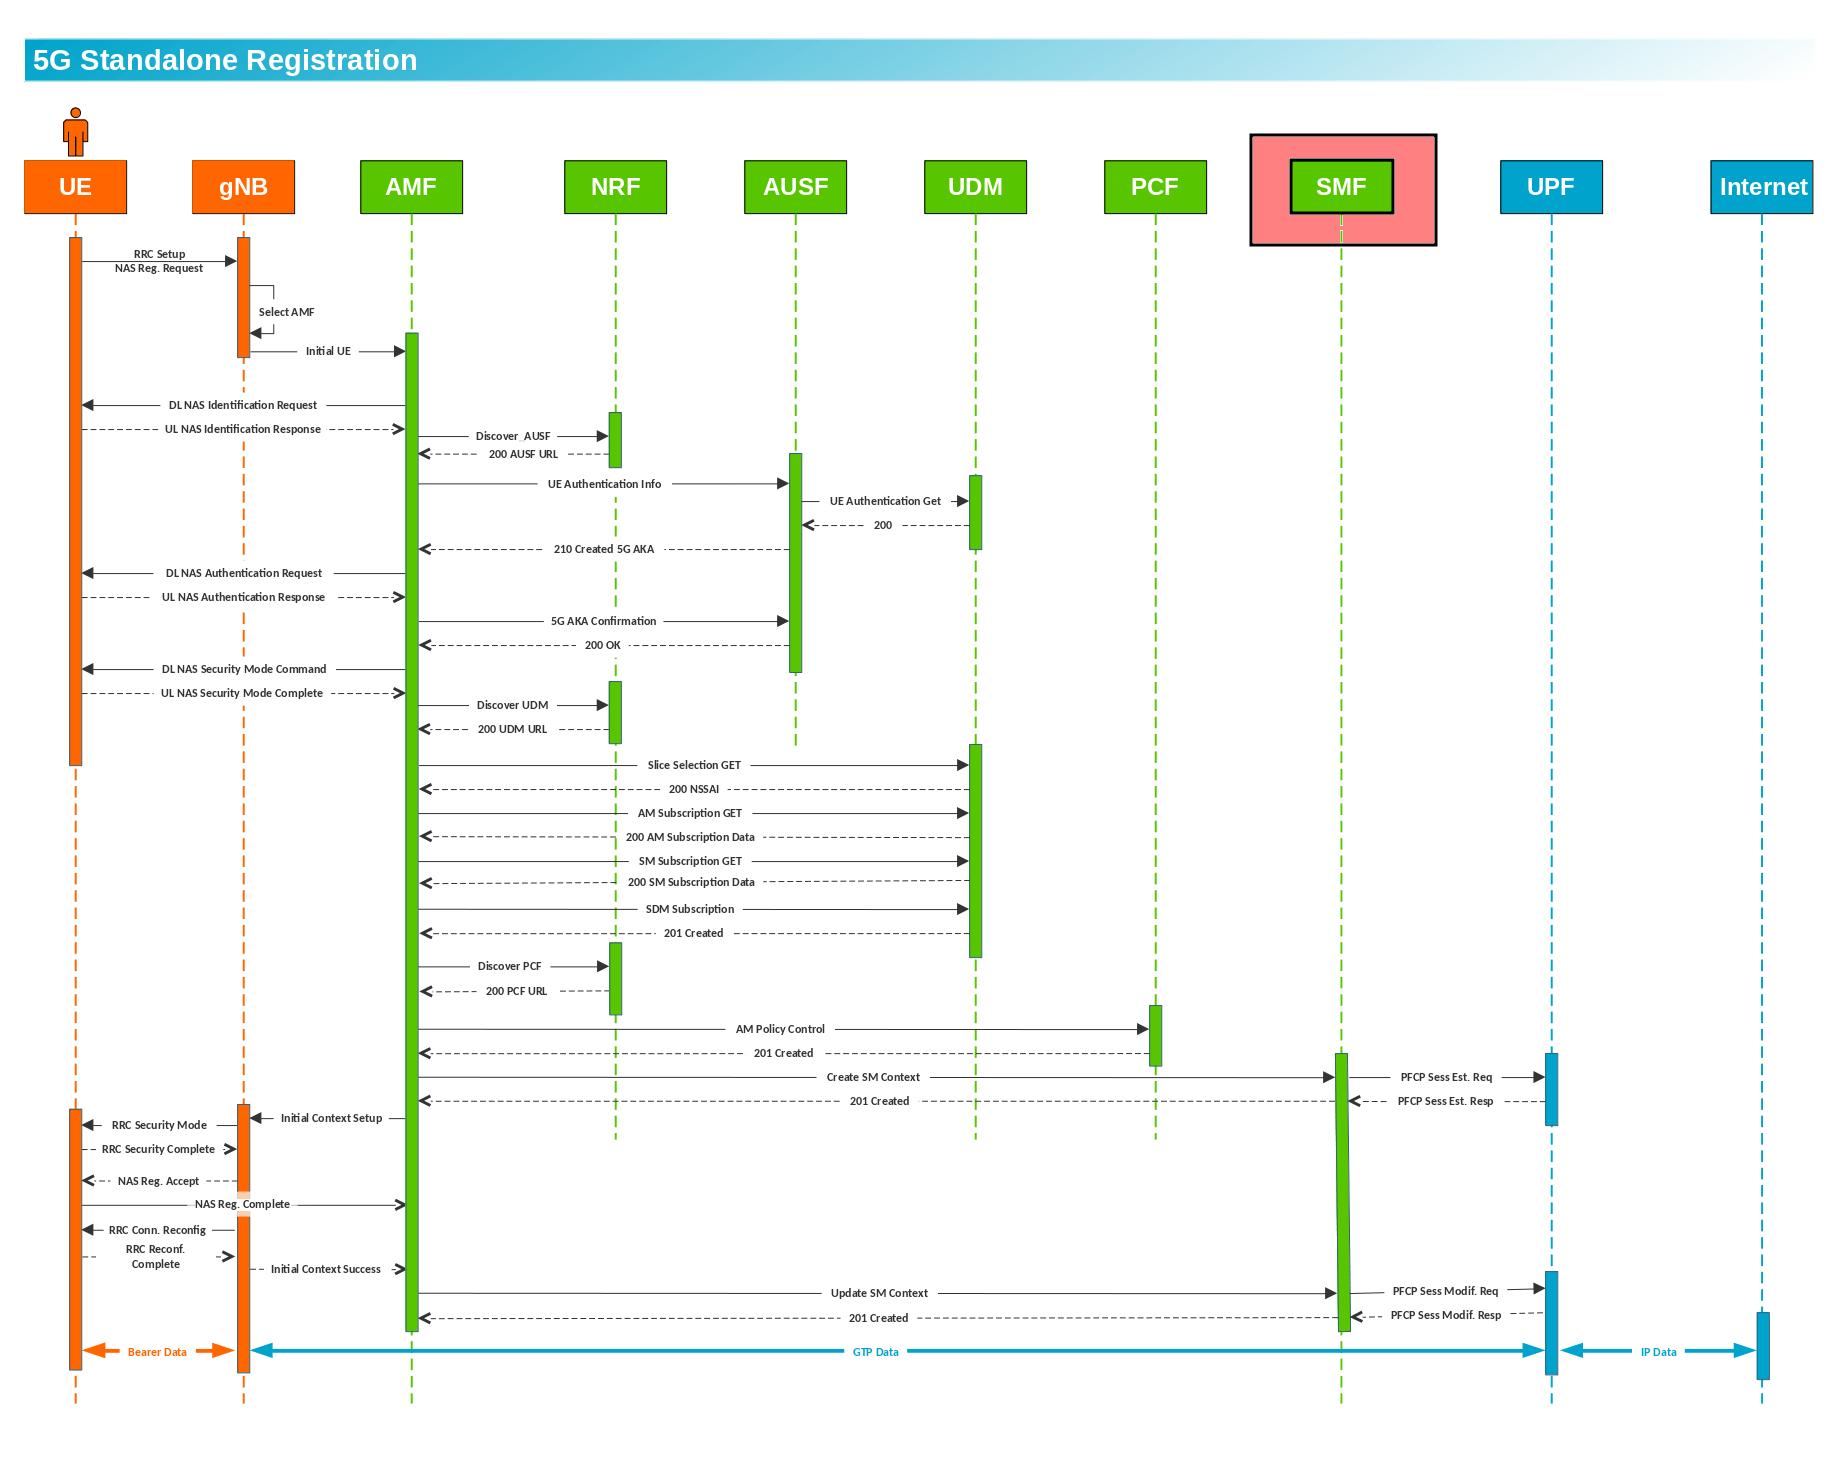 Session Management Function (SMF) 3